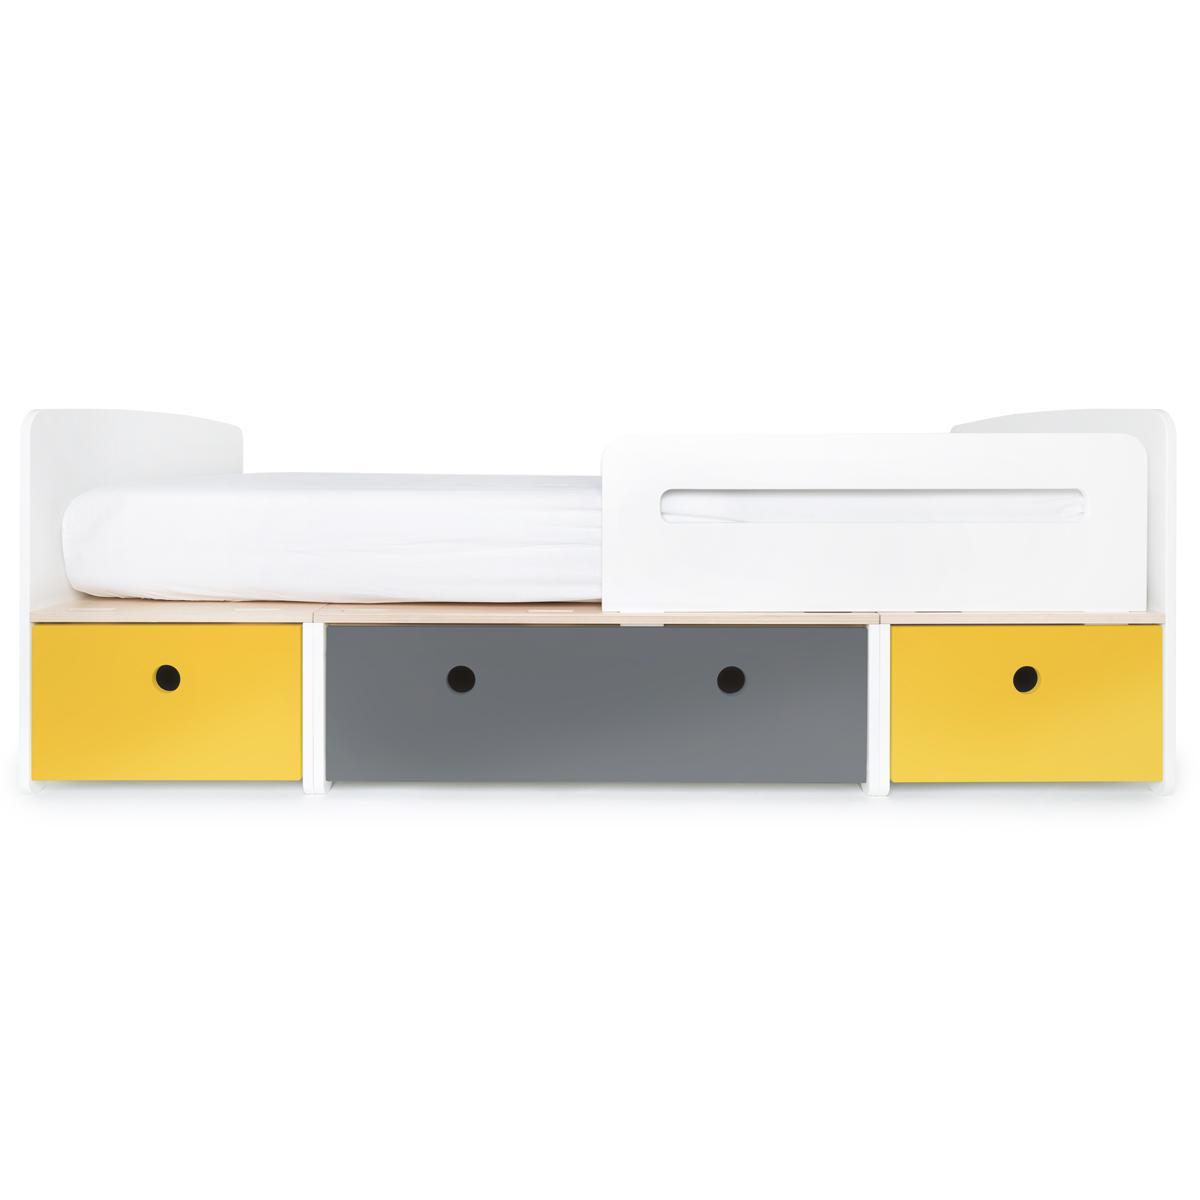 Cama evolutiva 90x200cm COLORFLEX Abitare Kids nectar yellow-space grey-nectar yellow